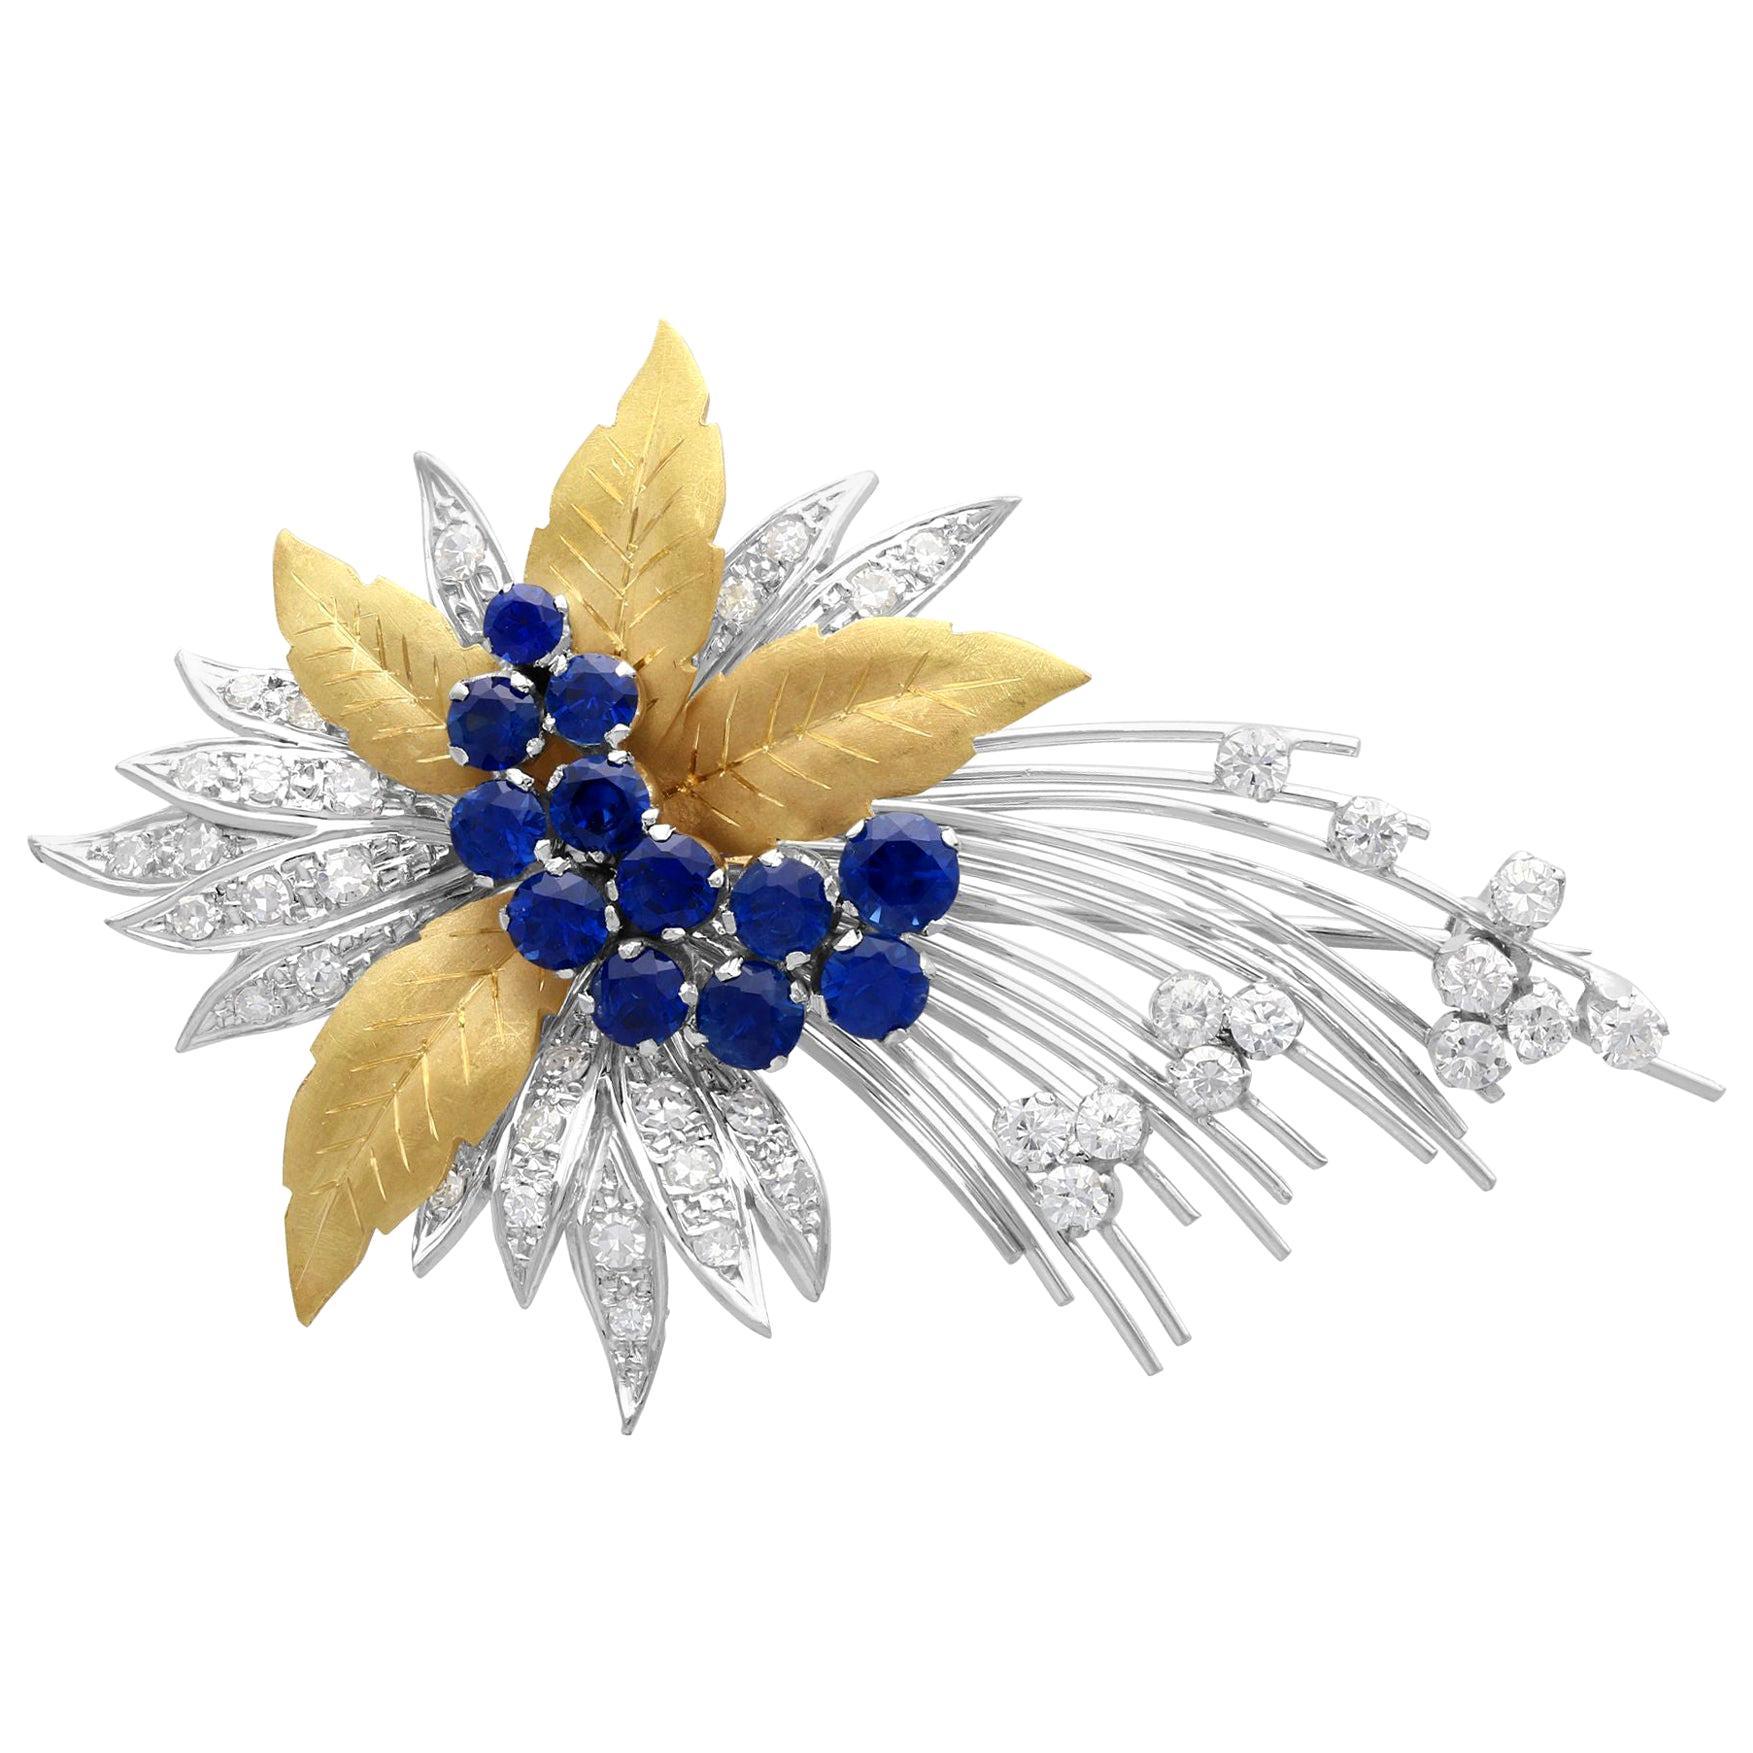 Vintage 1.60 Carat Sapphire and 1.12 Carat Diamond Yellow Gold Spray Brooch 1991